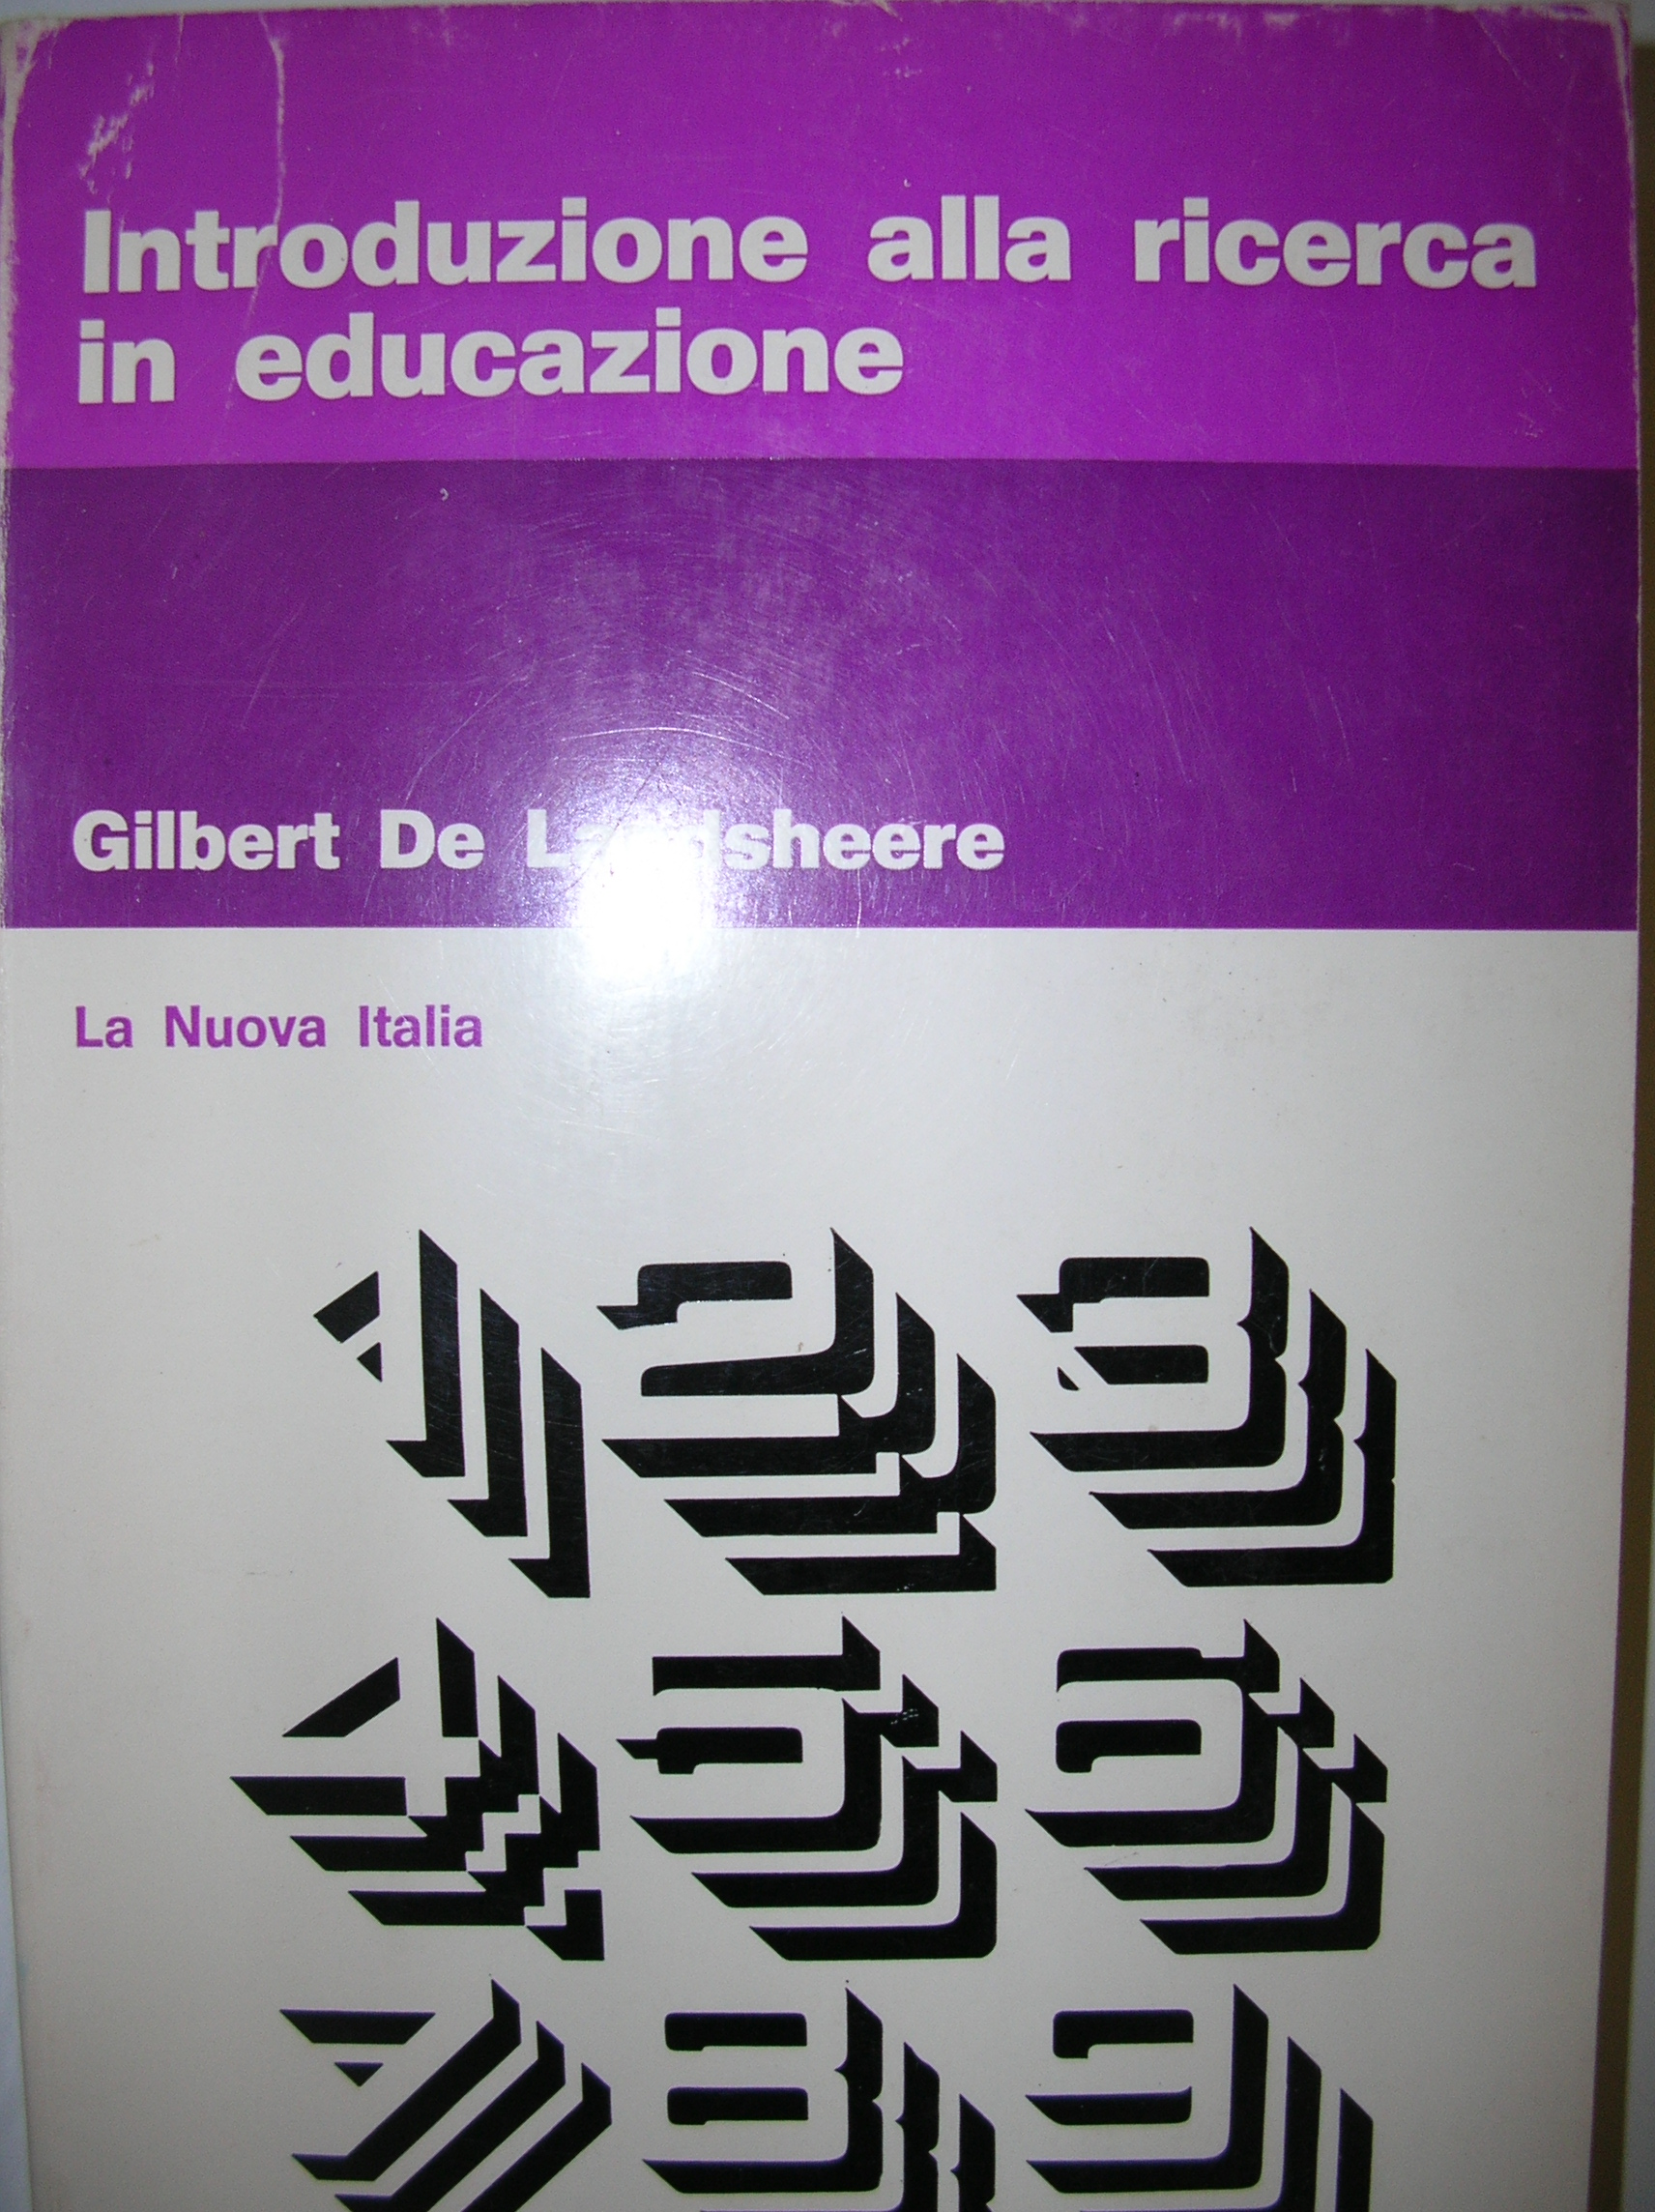 Introduzione alla ricerca in educazione